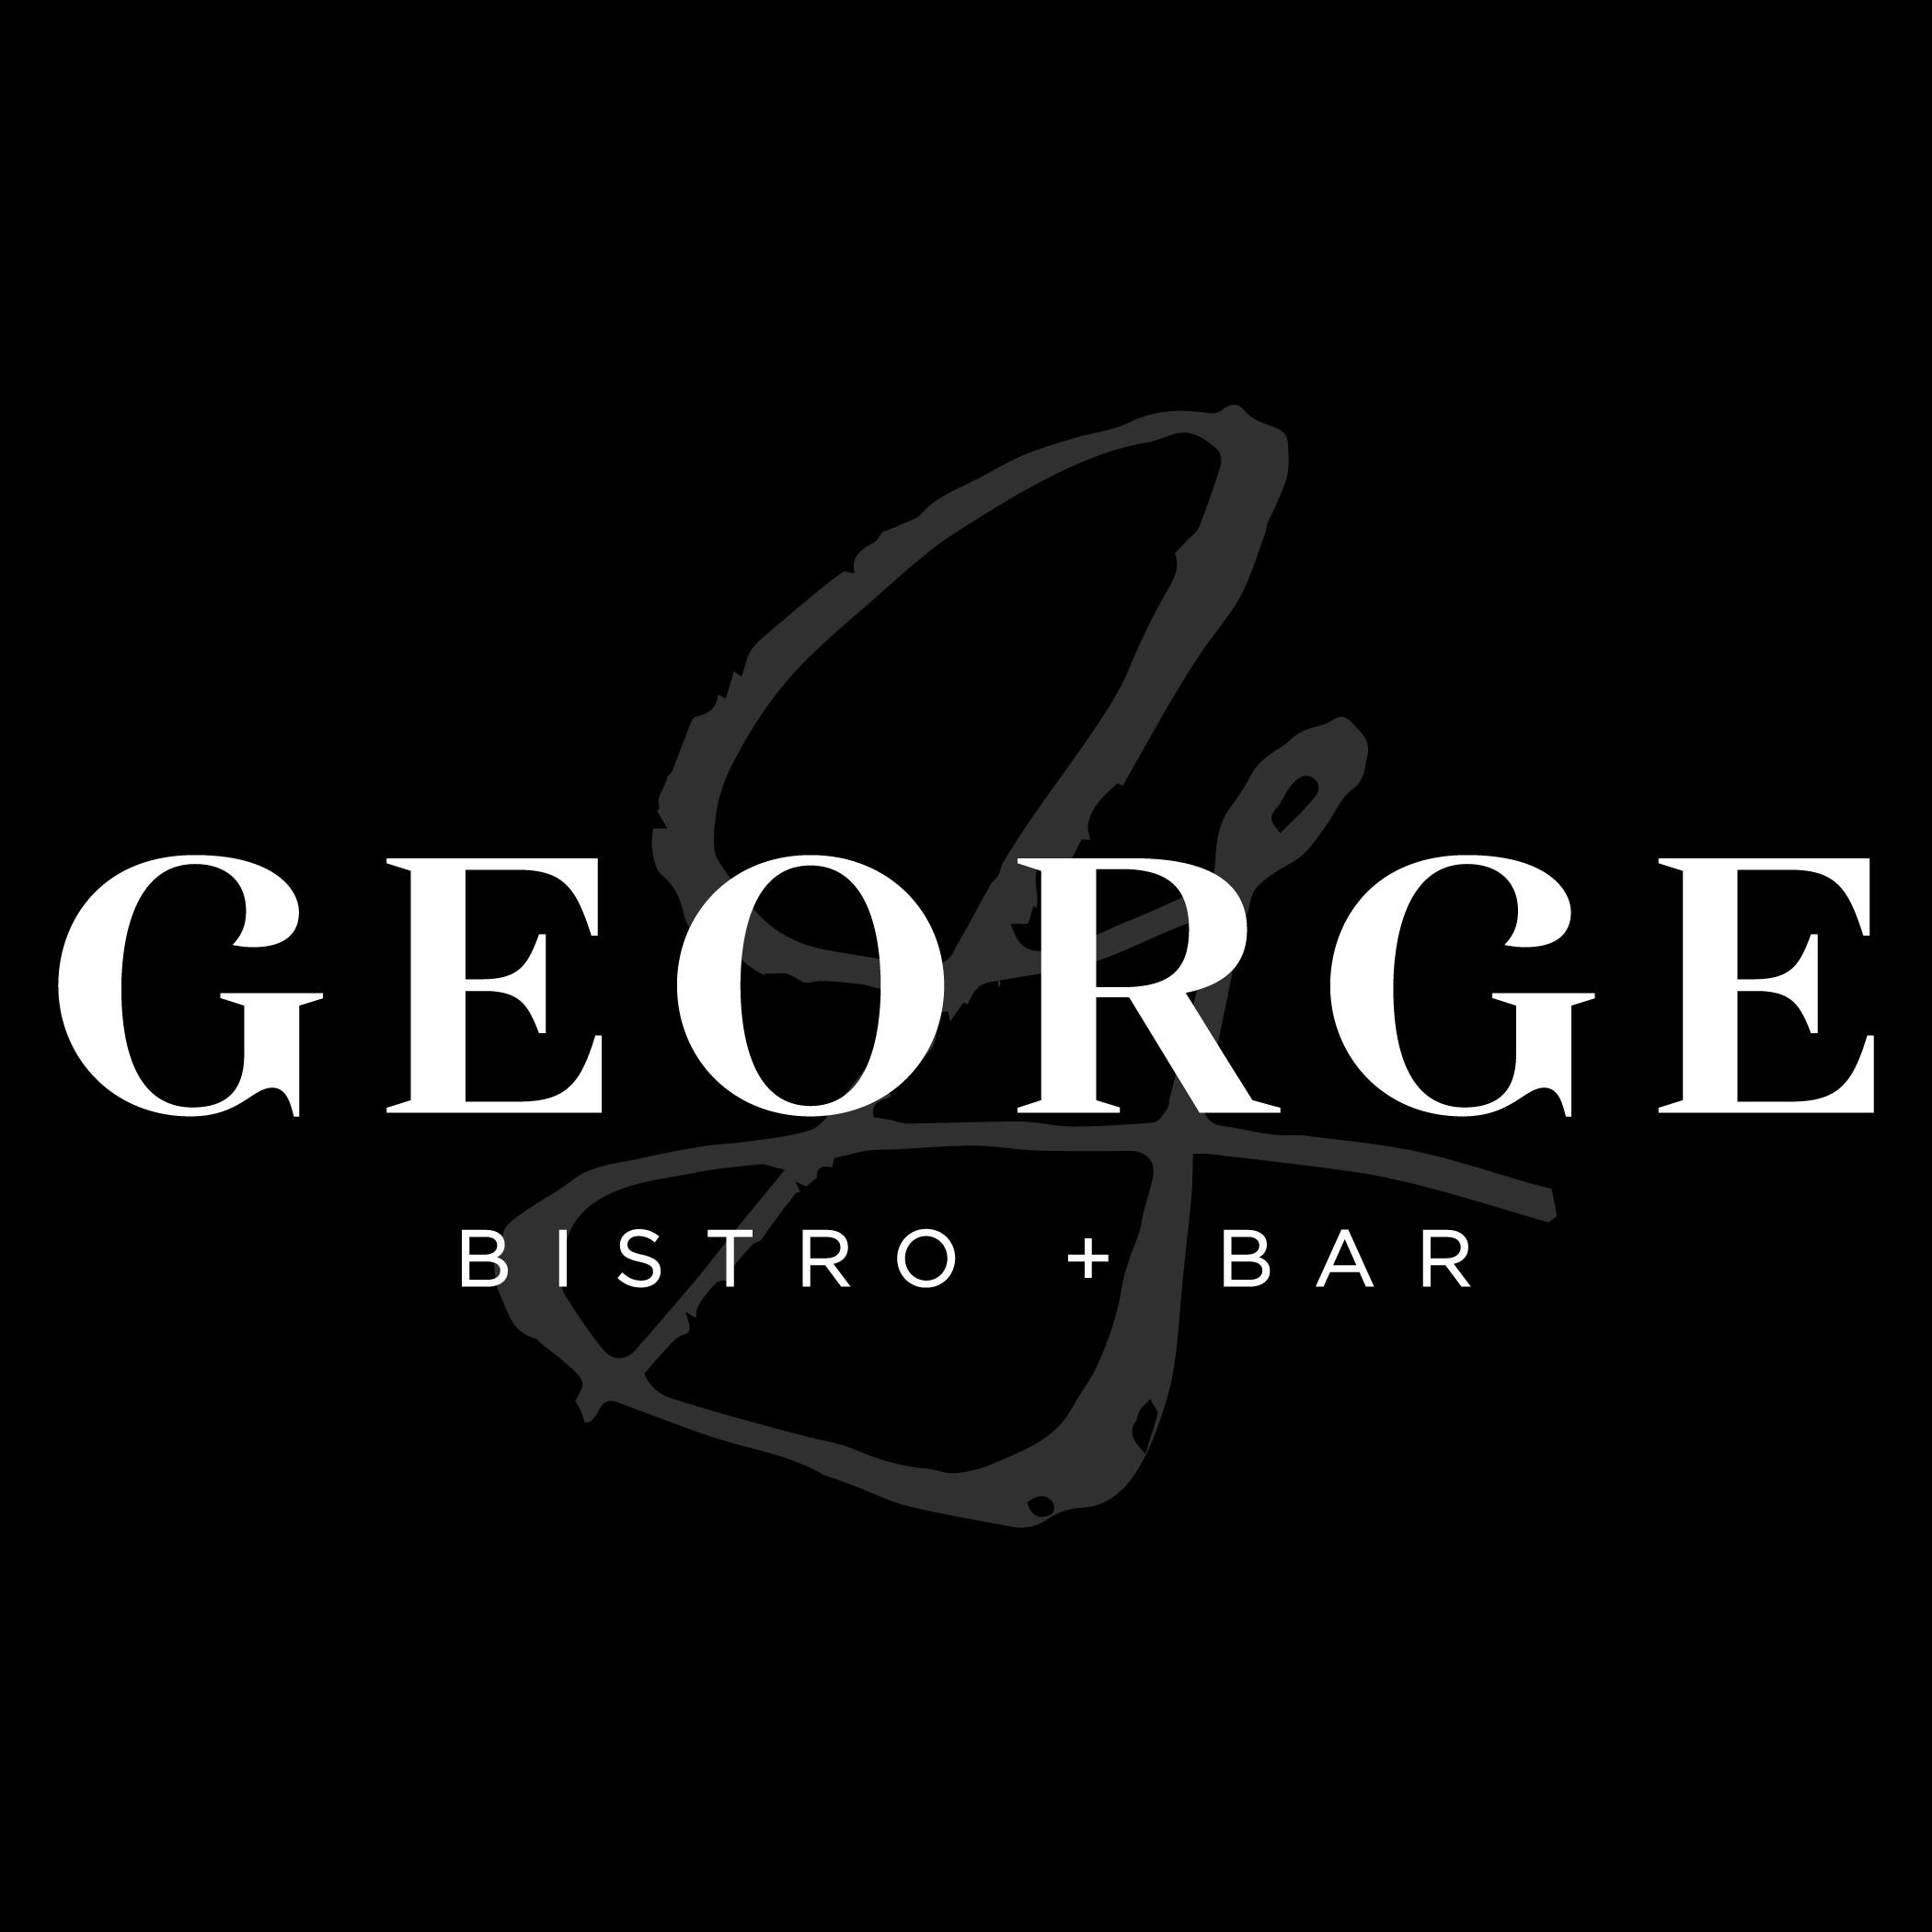 George Bistro + Bar